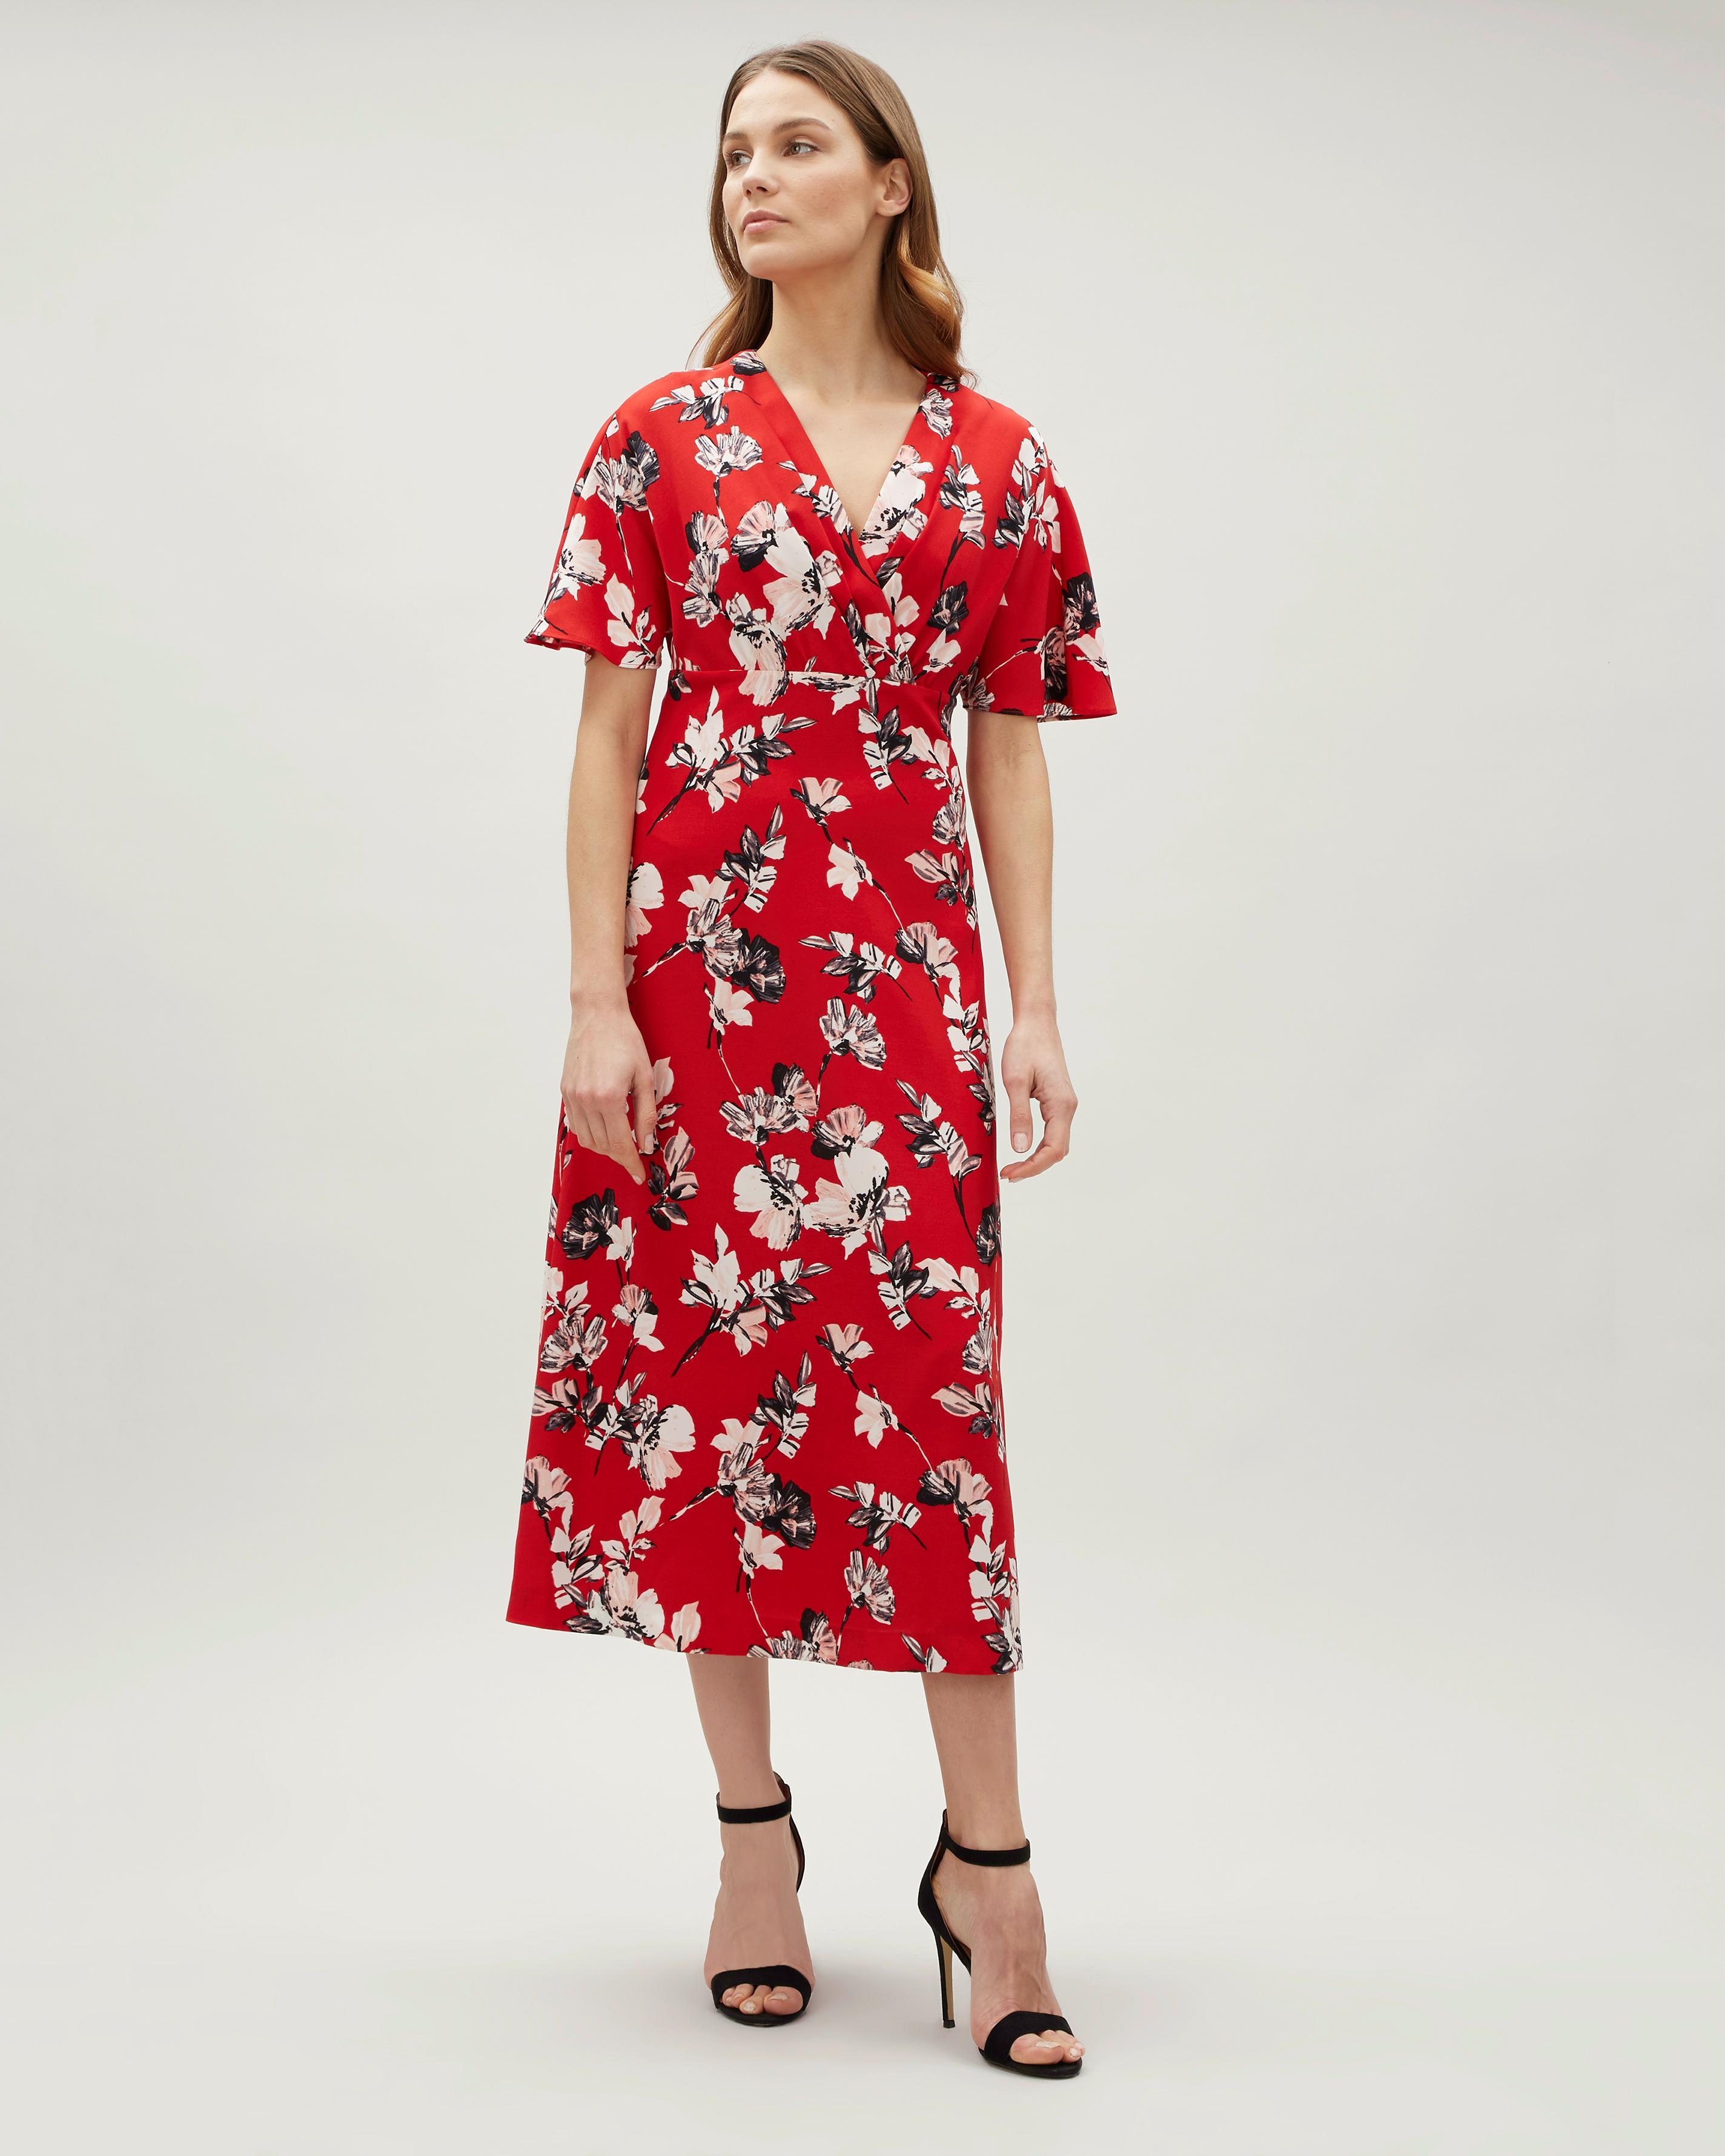 Lyst - Jaeger Brushstroke Floral Wrap Dress in Red 49968ac96